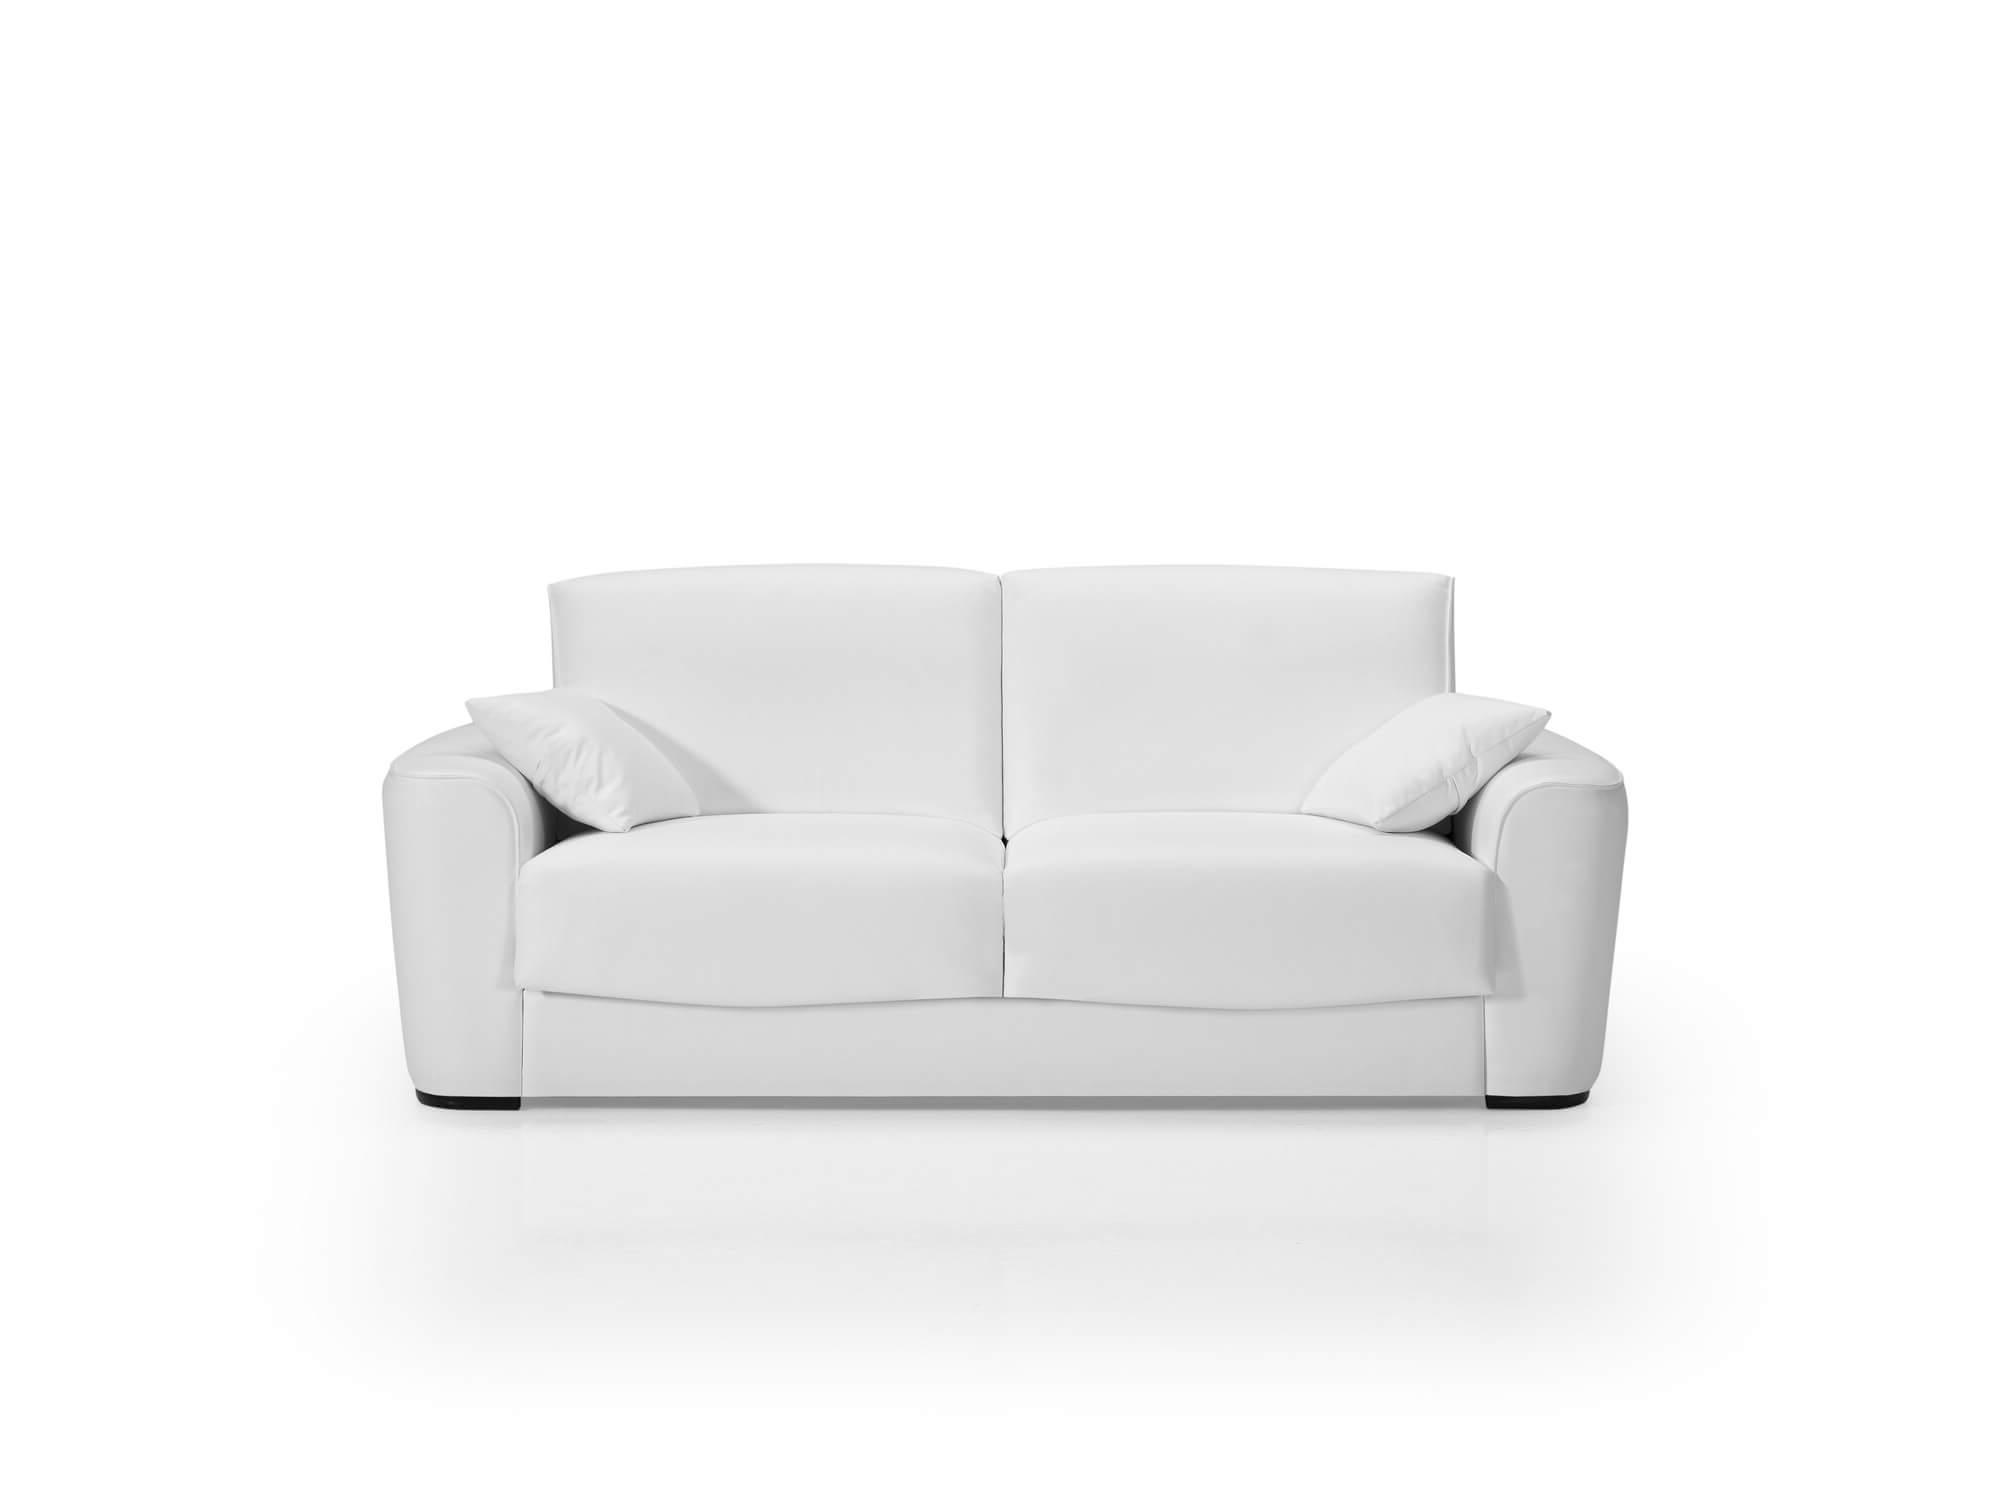 Sofa Cama Blanco T8dj sofa Cama Blanco Barato at007